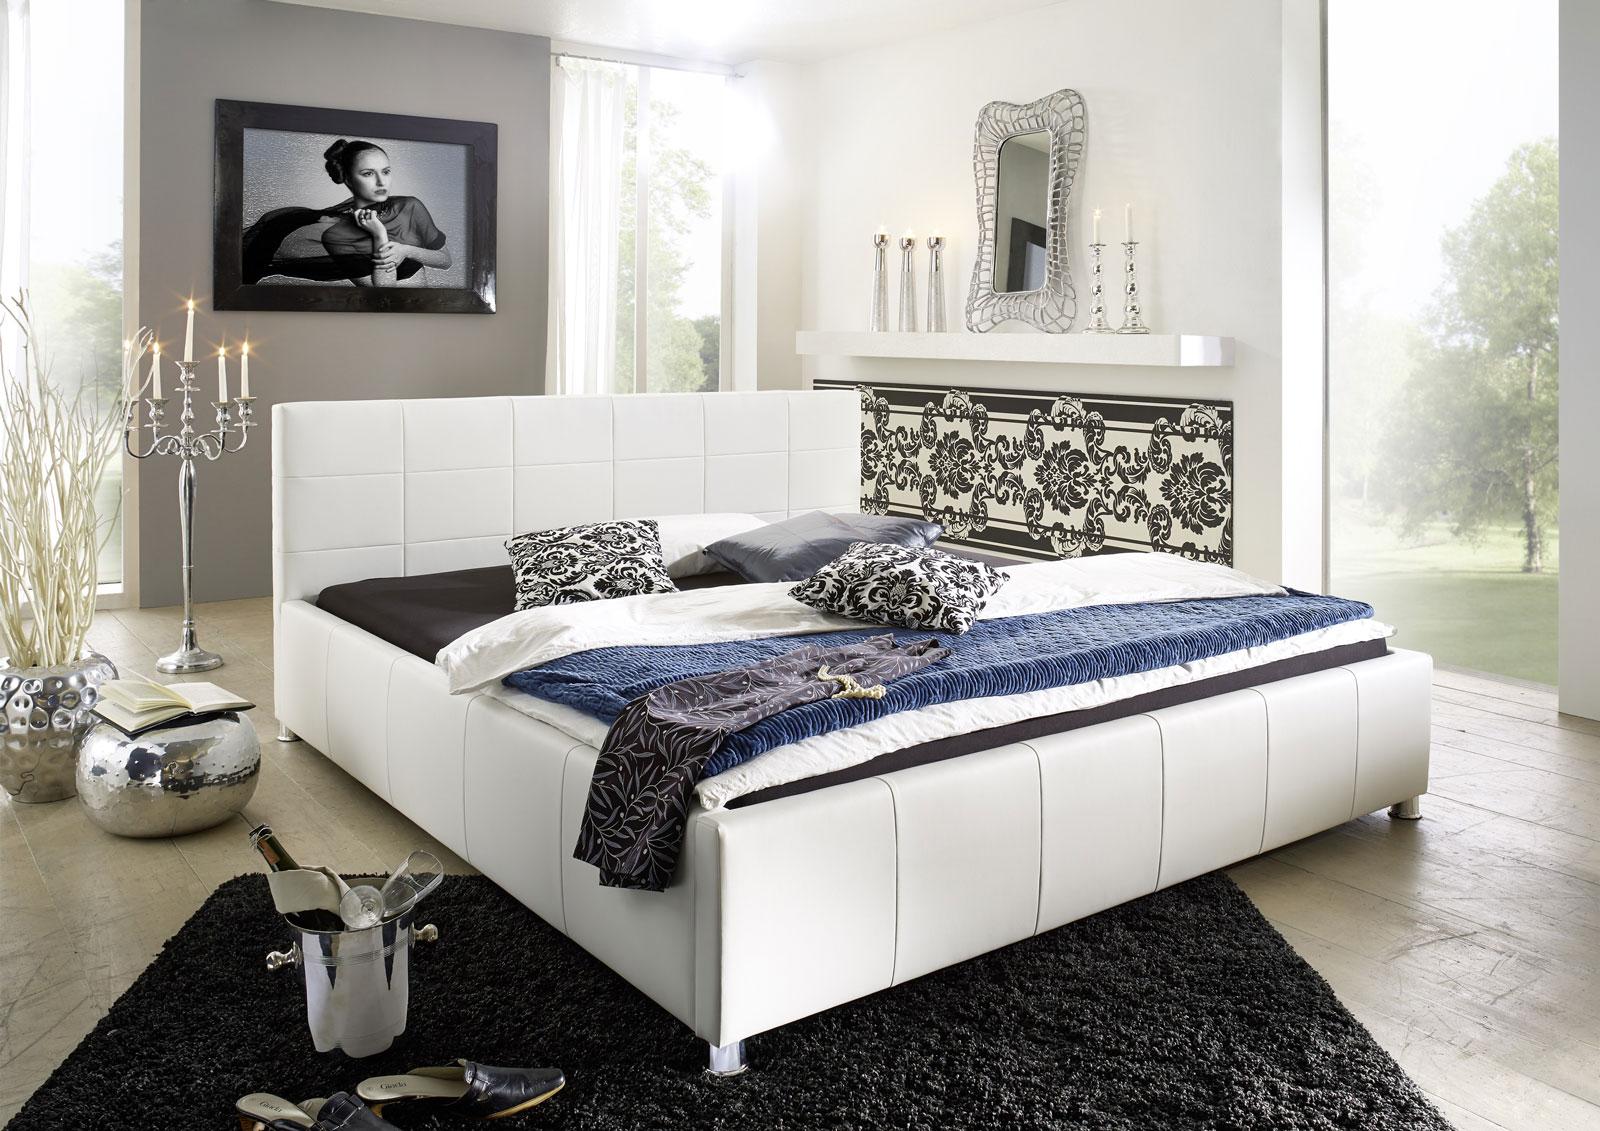 sam polster bett 140 x 200 cm wei kira auf lager. Black Bedroom Furniture Sets. Home Design Ideas